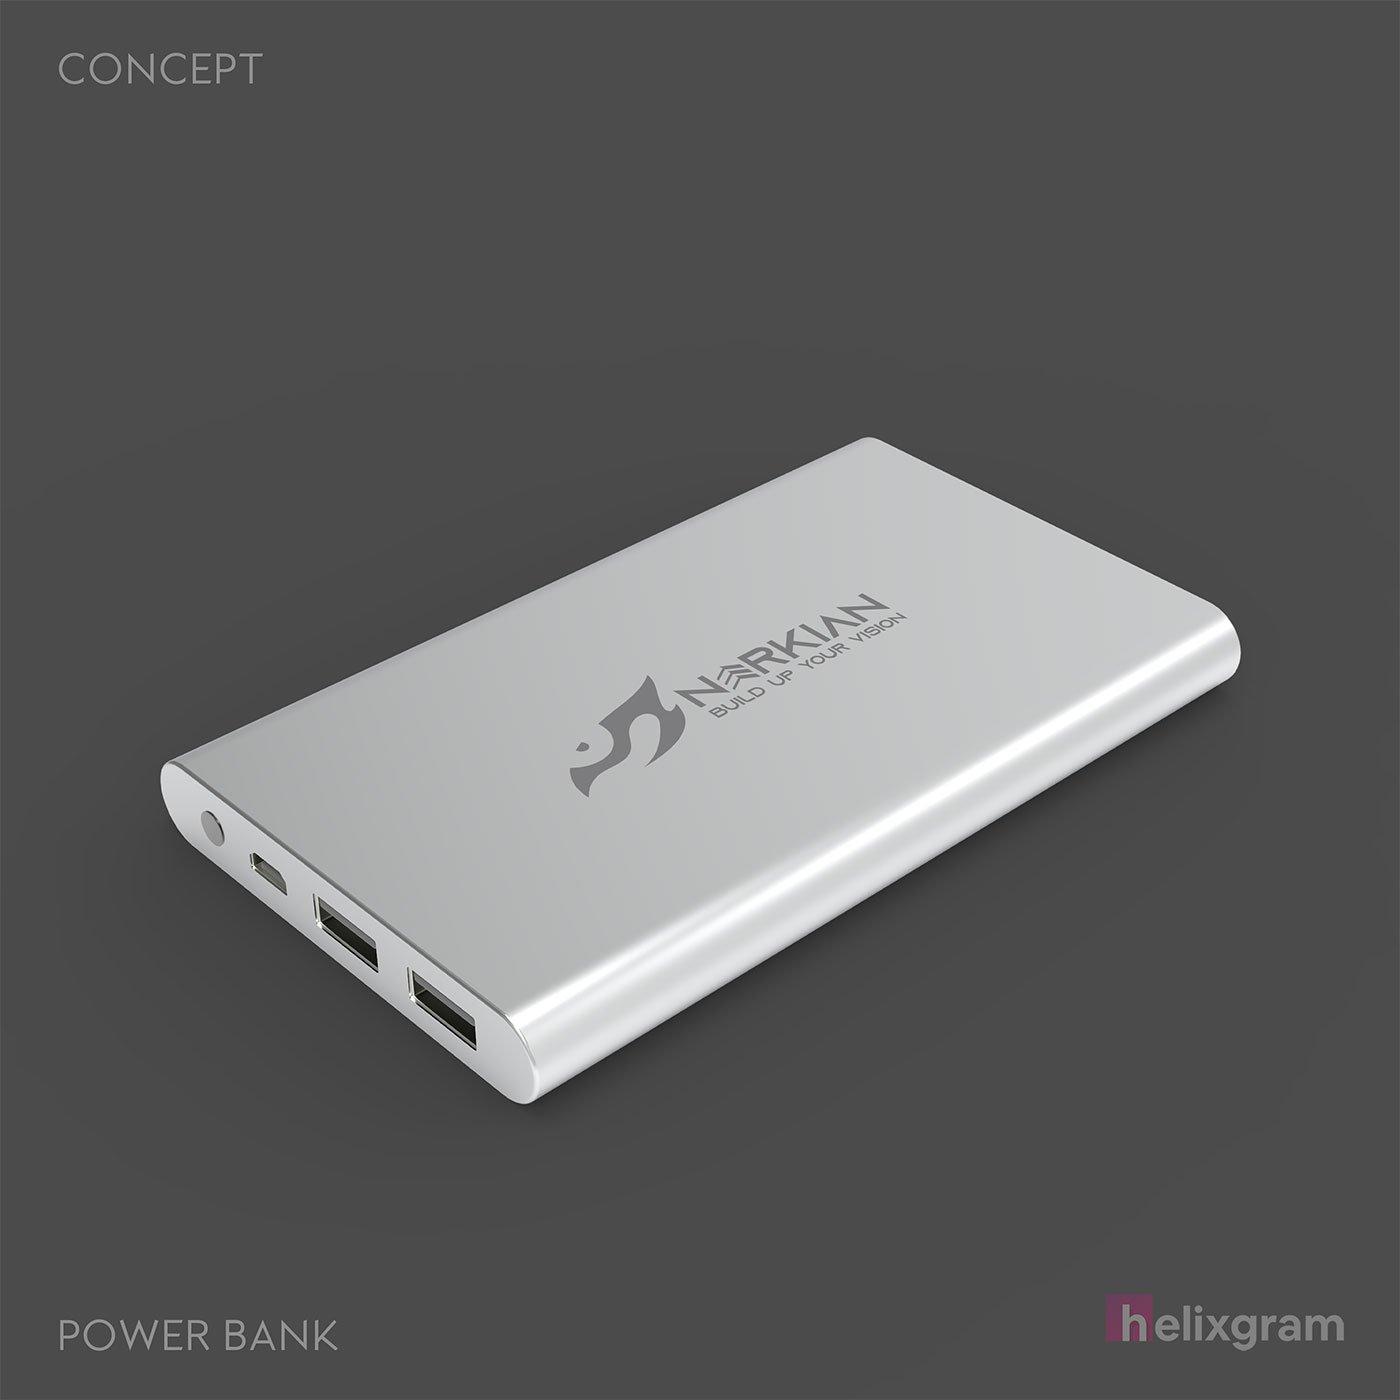 Brand-Identity-Power-bank-Narkian-design-visual-identity-design-package-corporate-identity-design-logo-design-flyer-poster-book-cover-design-web-design-digital-advertising-Helixgram